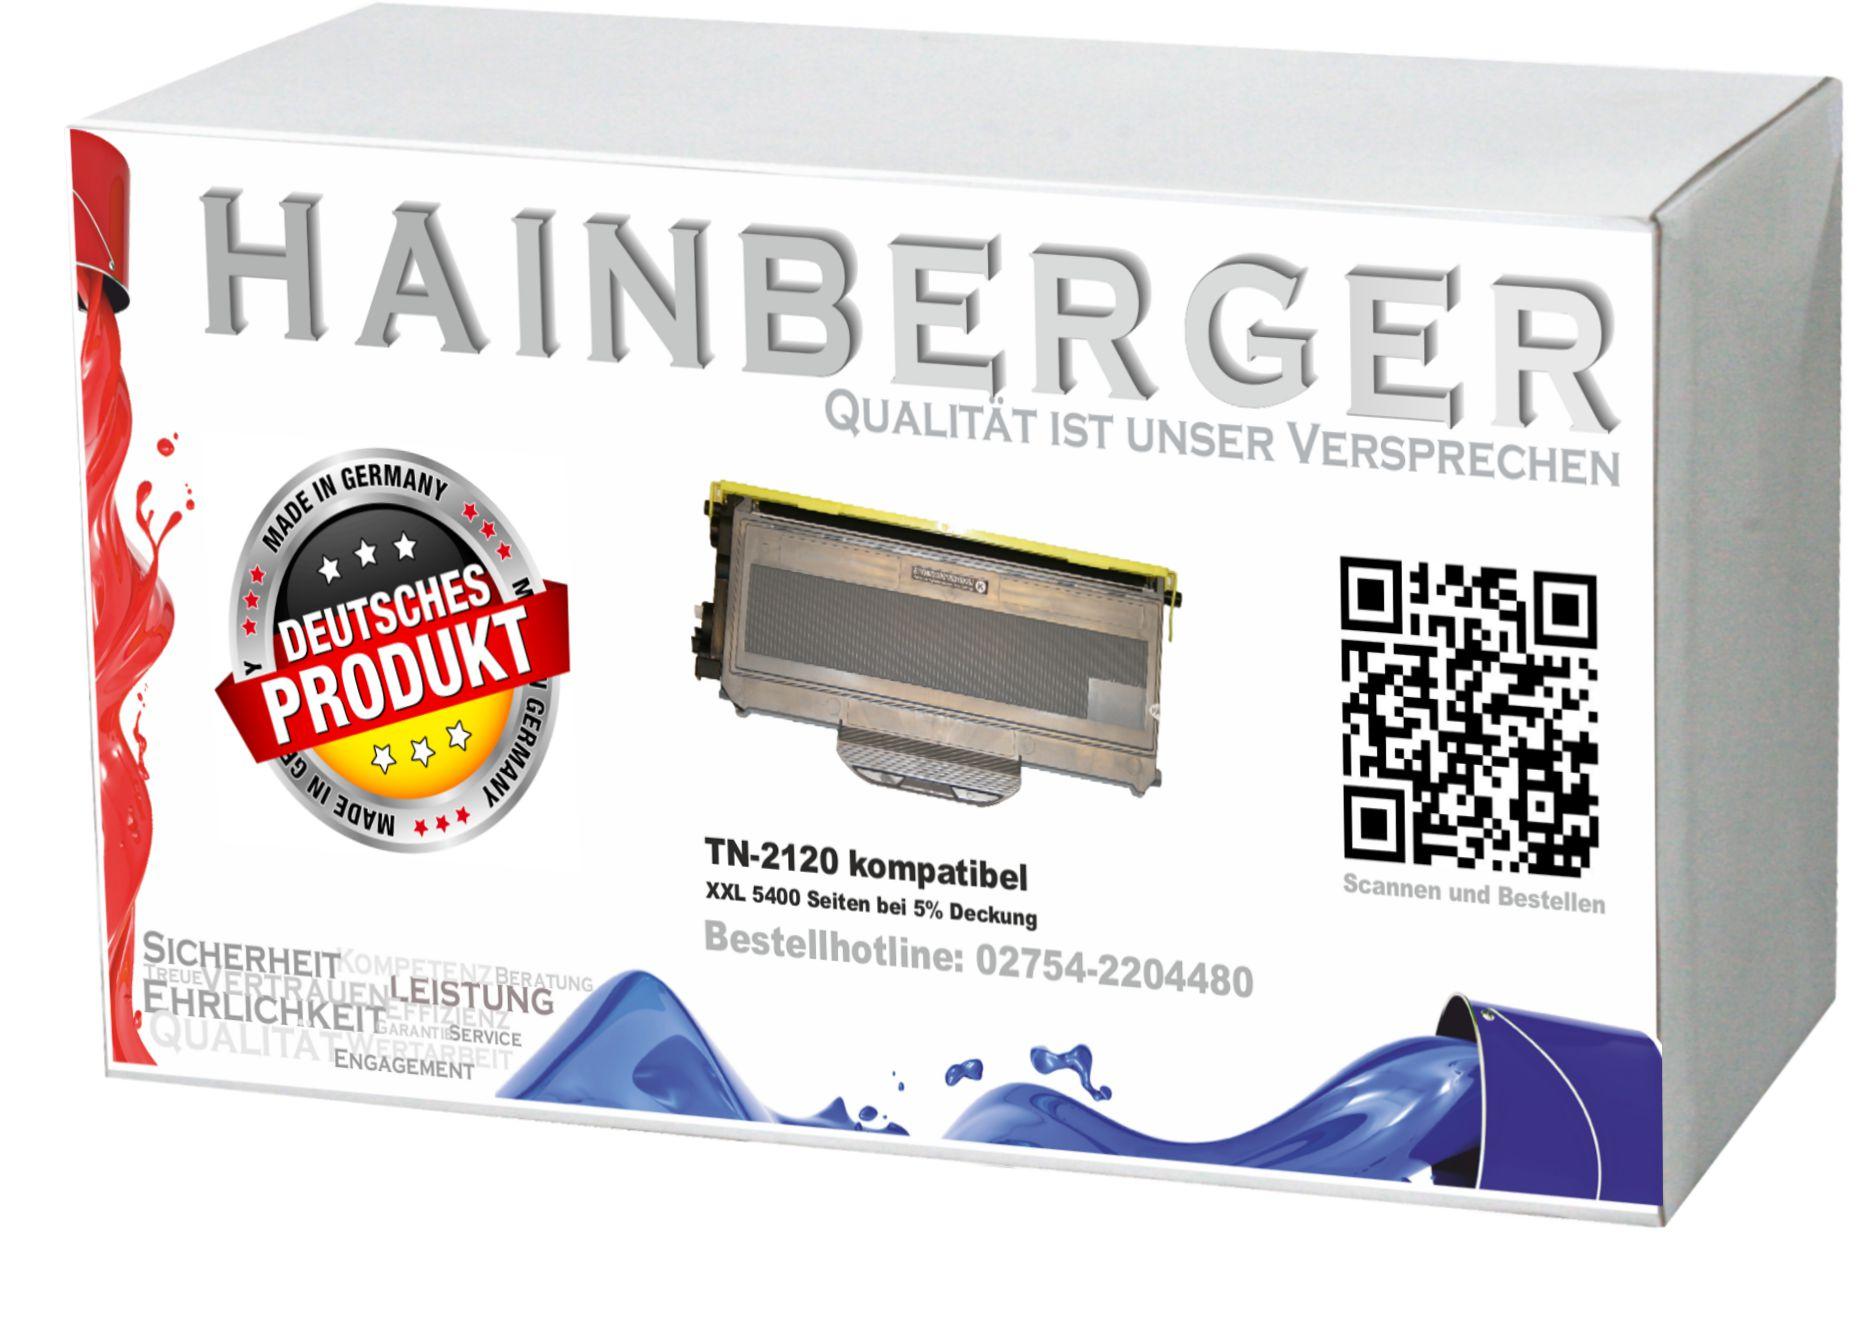 Hainberger